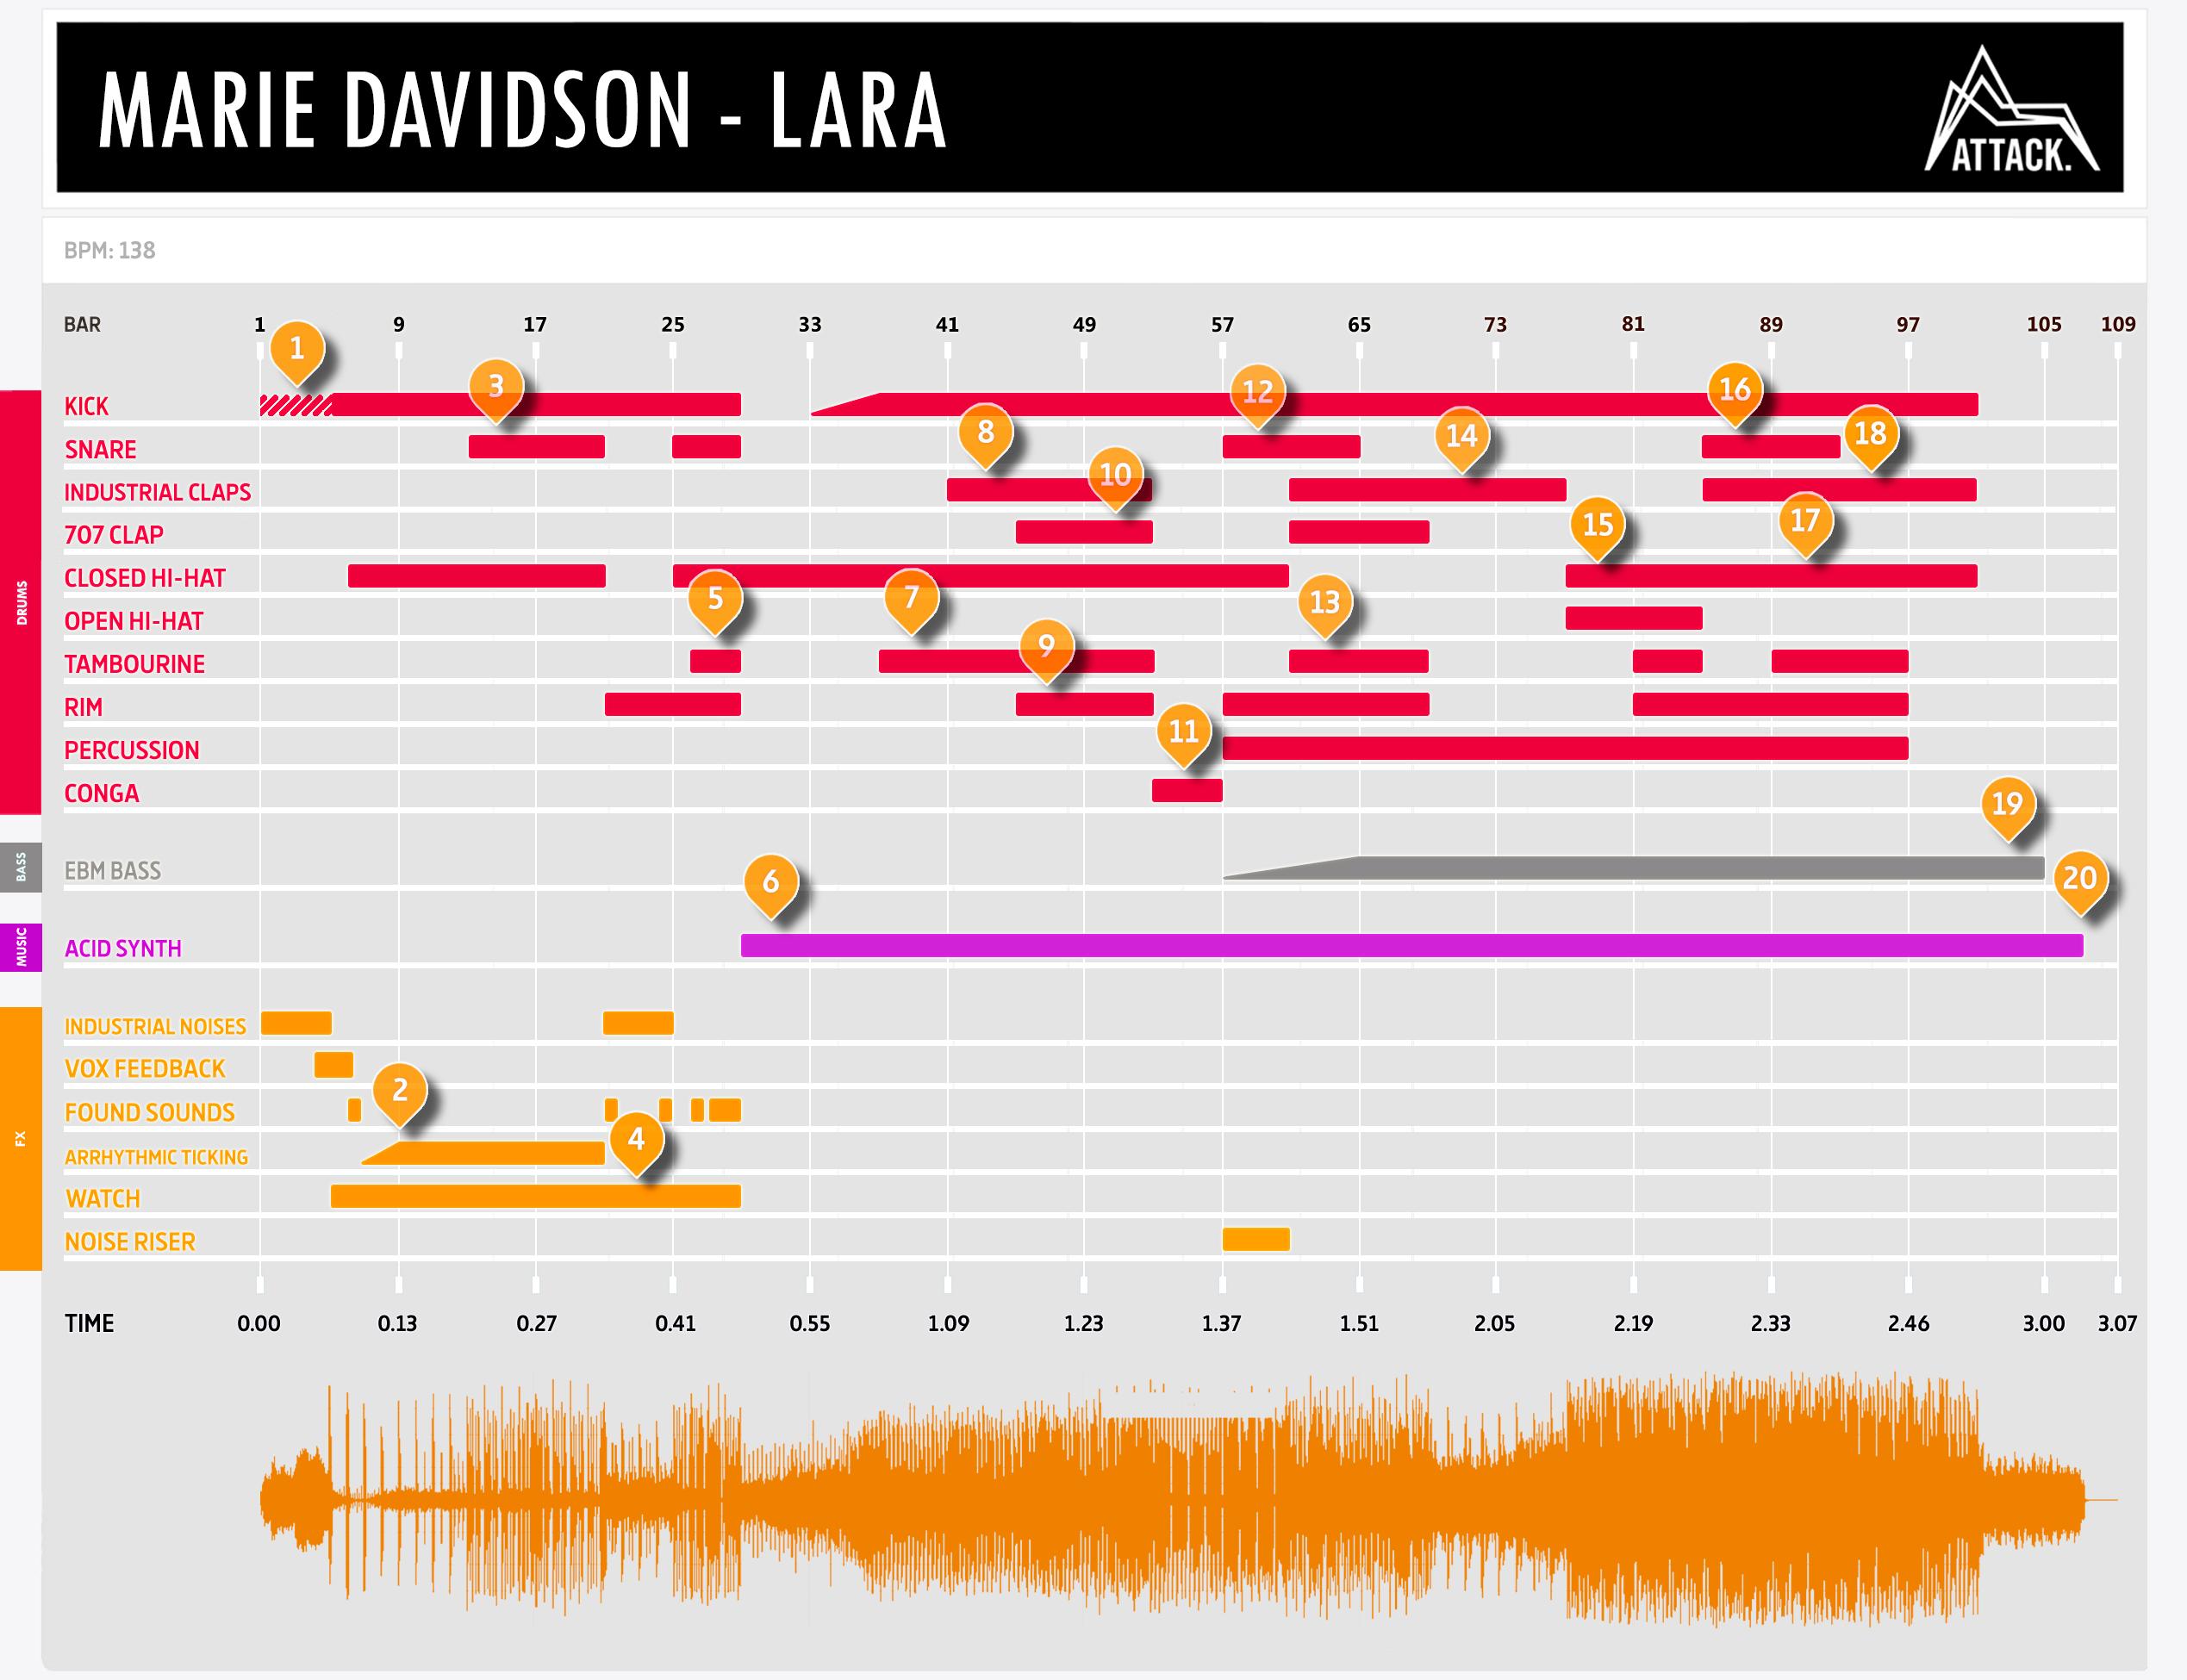 Marie Davidson - Lara